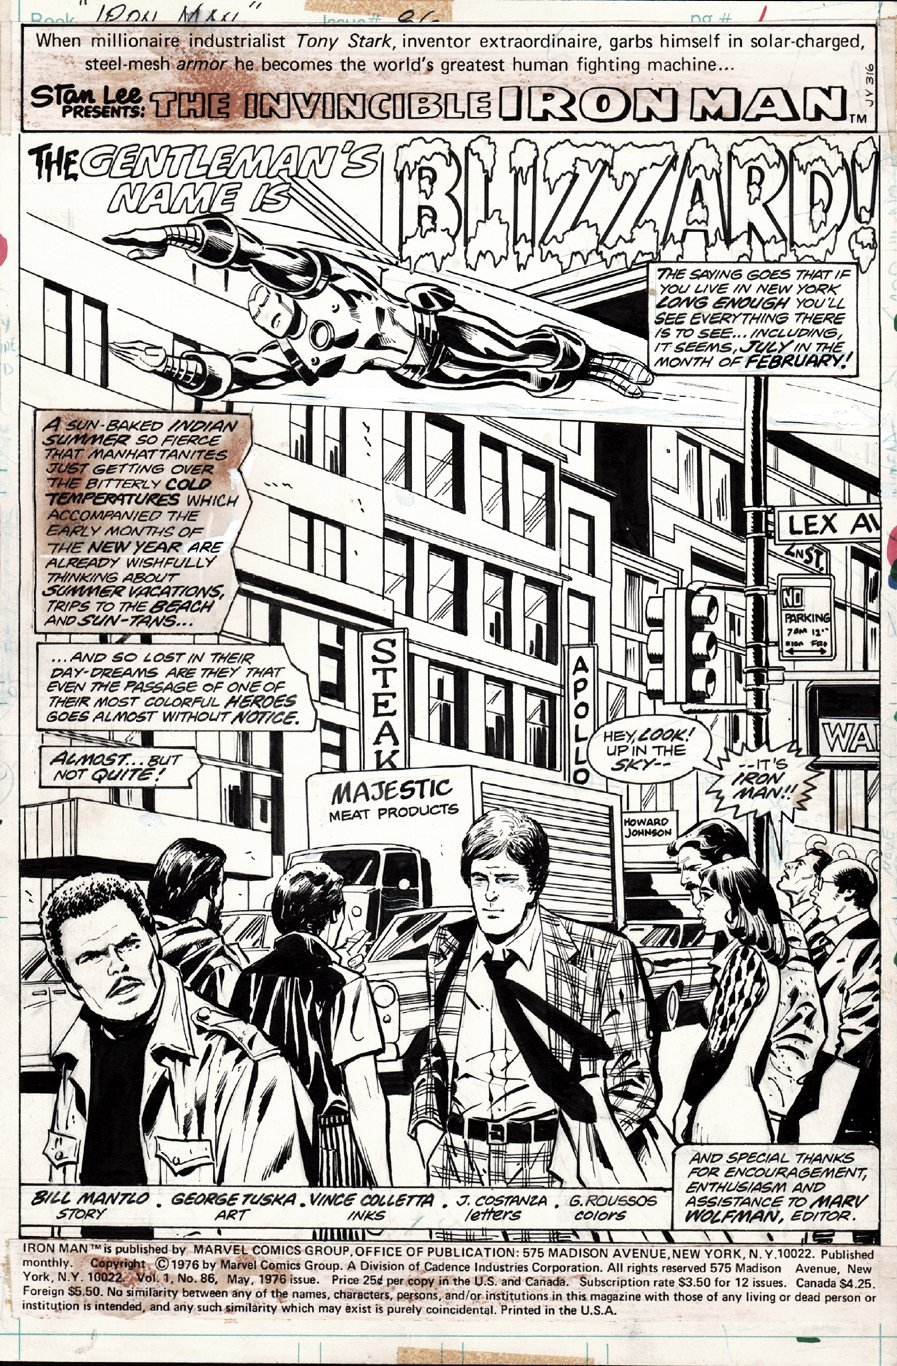 Iron Man #86 p 1 SPLASH (1976)